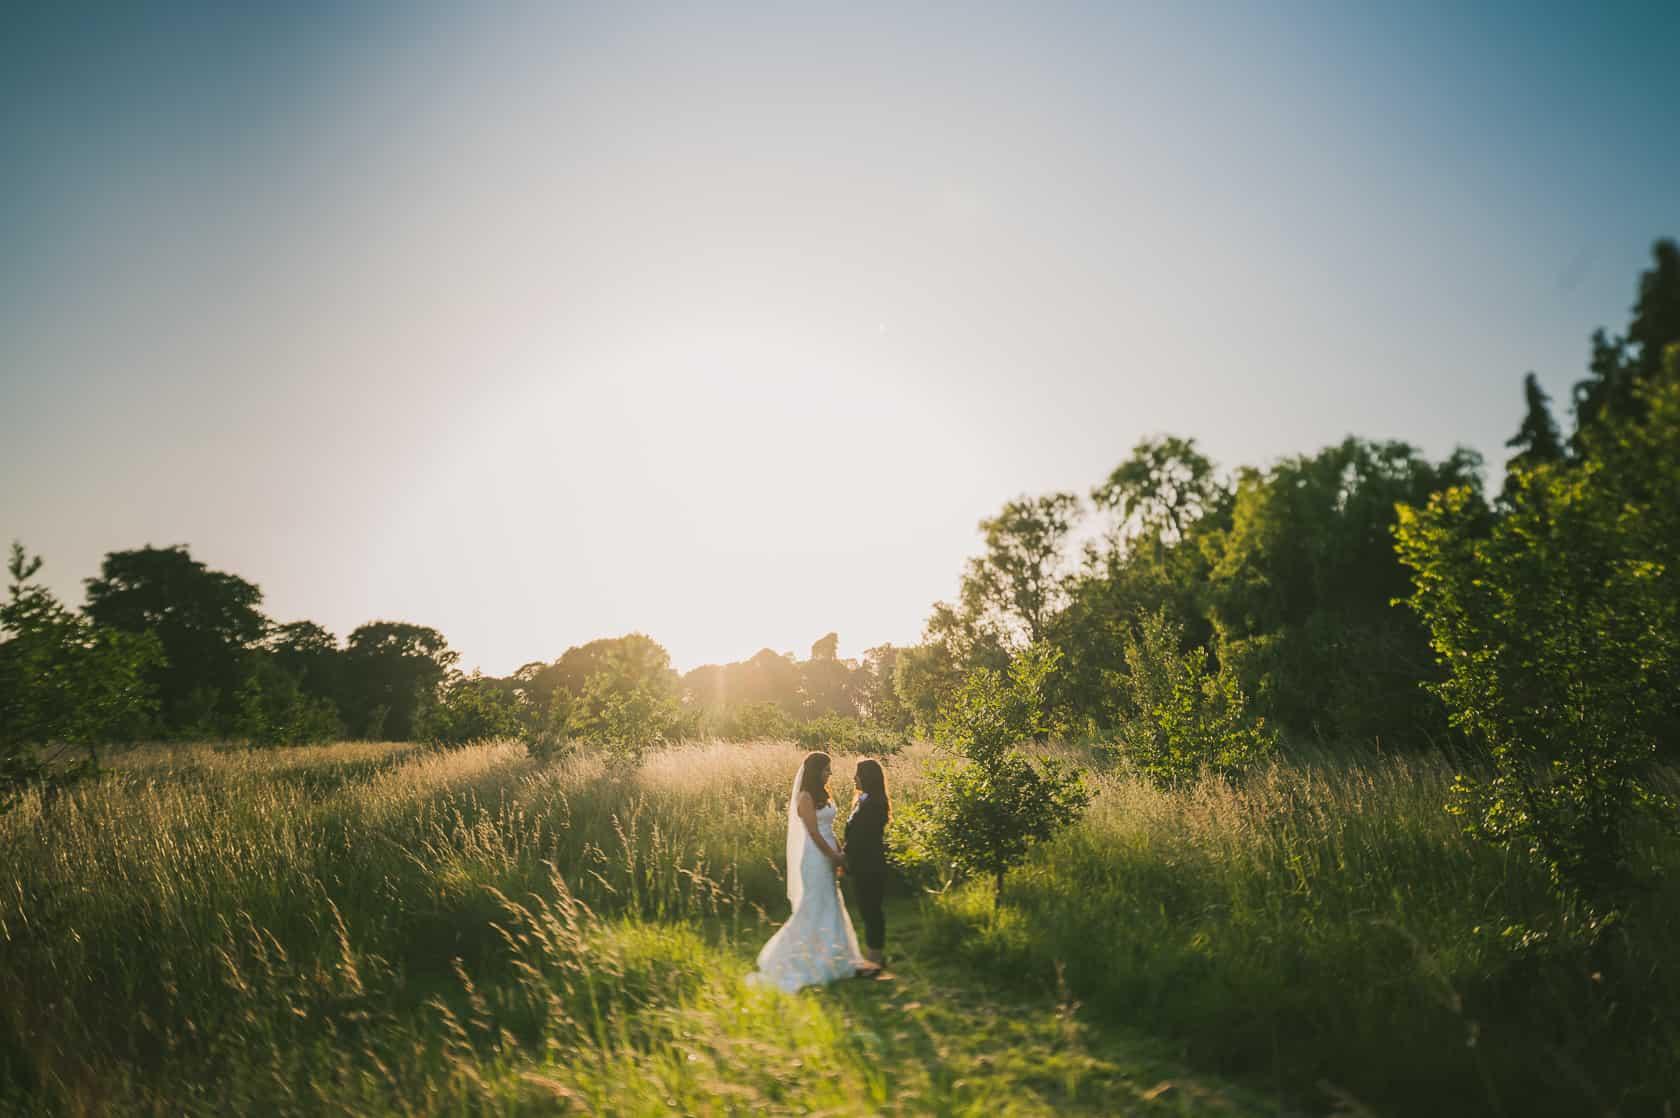 Best_Wedding_Photography_2019_Wedding-Photographer-Essex_029